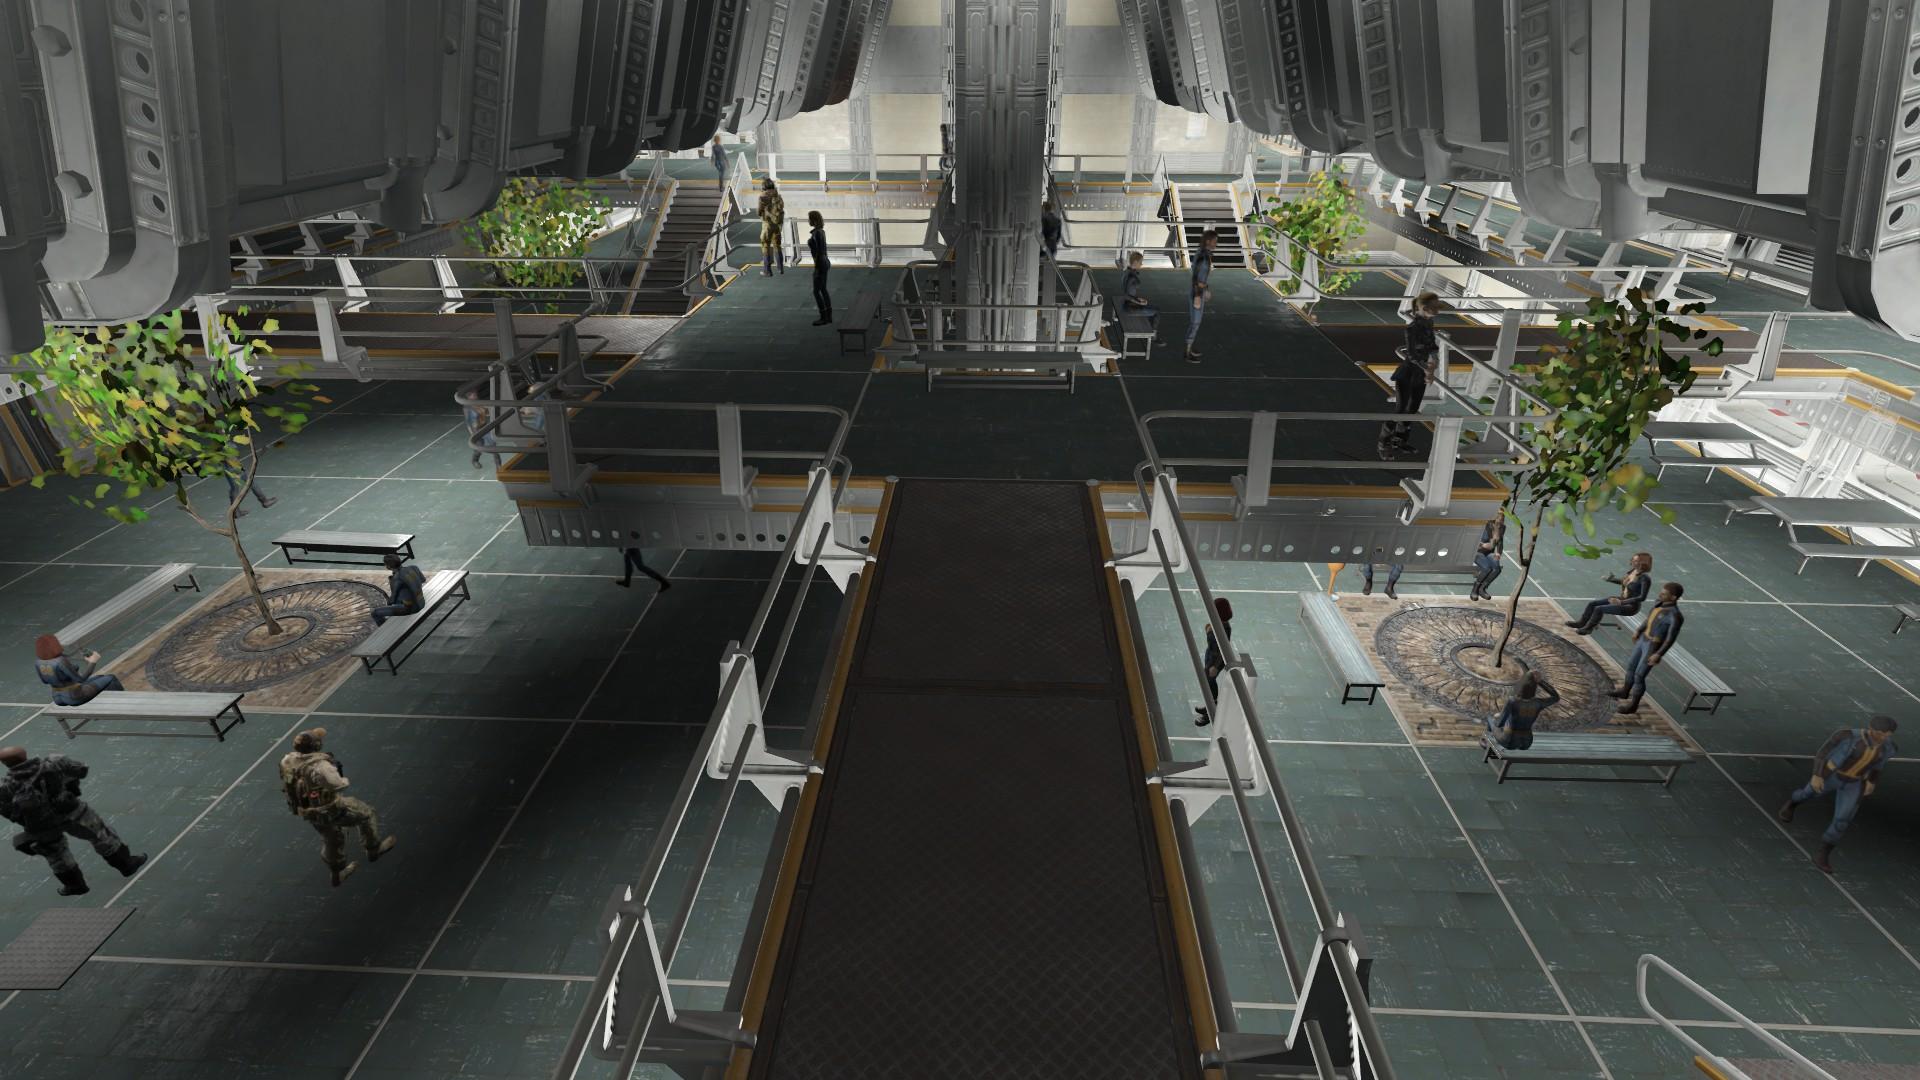 FO4 [Vault Workshop] Building Vaults? 03F9CDF549C89F9DED56640D55B58E2CAAFC251B